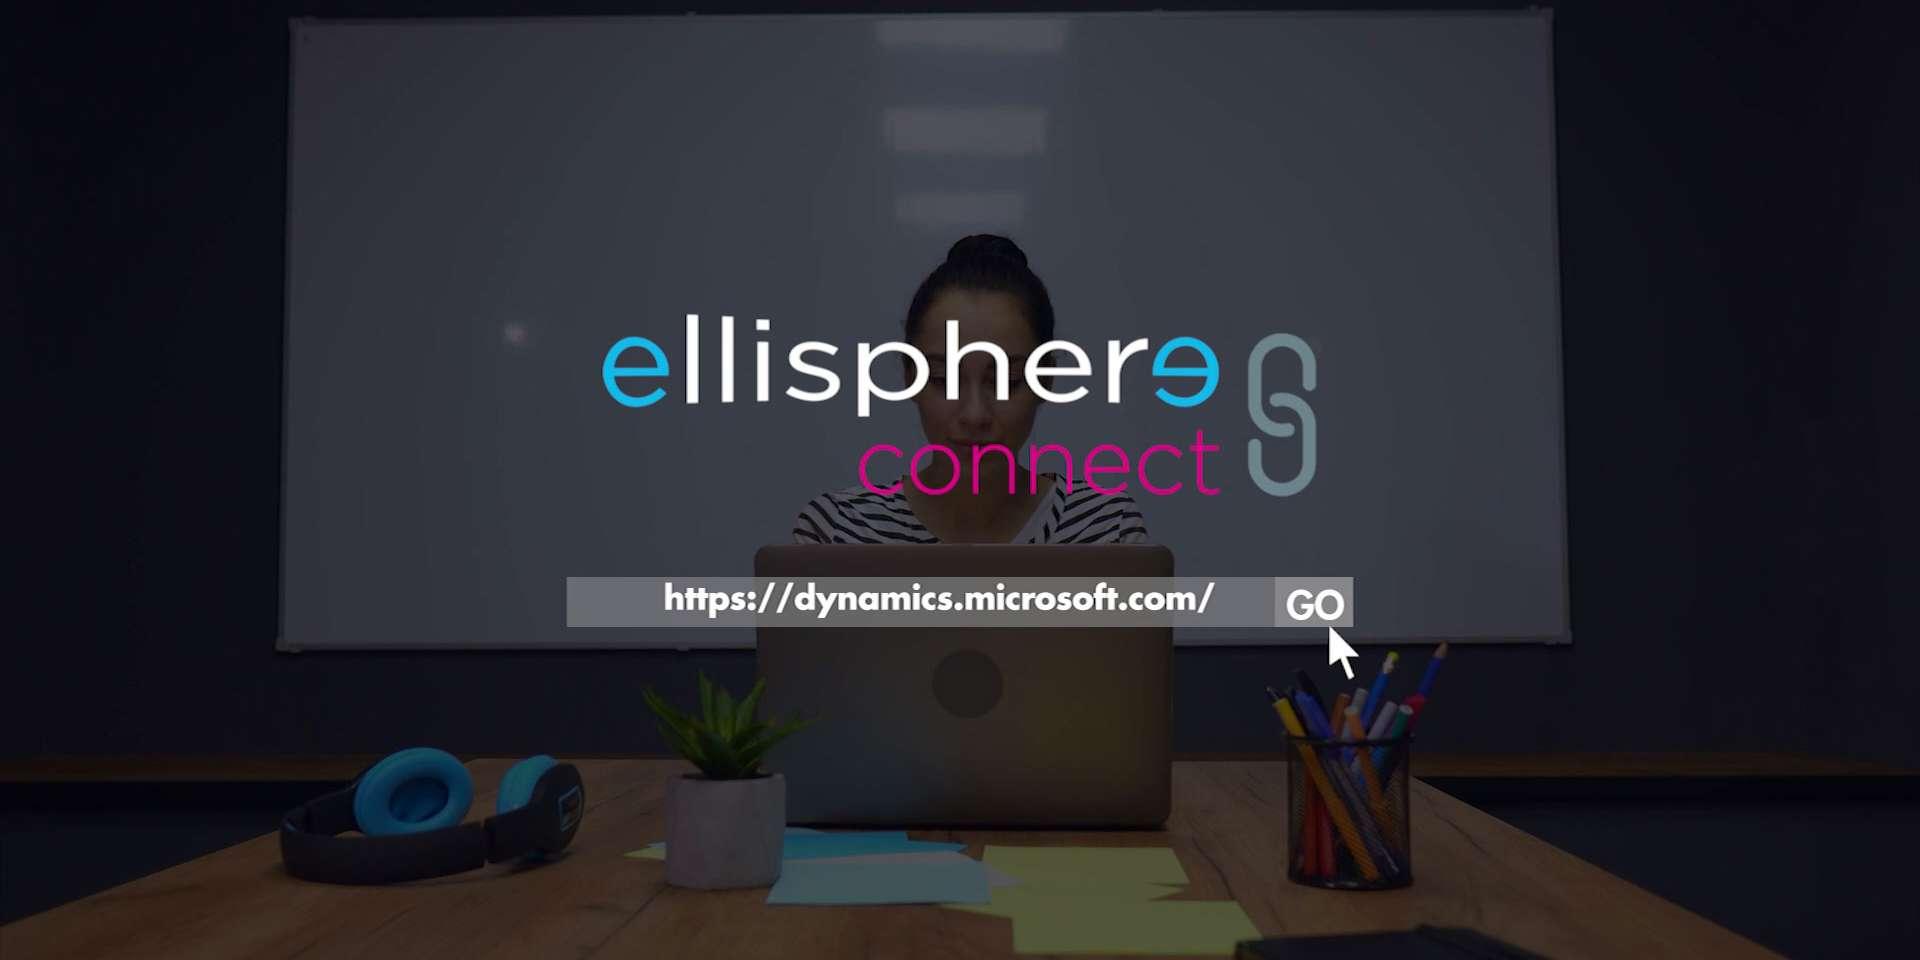 Ellisphere Connect Microsoft Dynamics